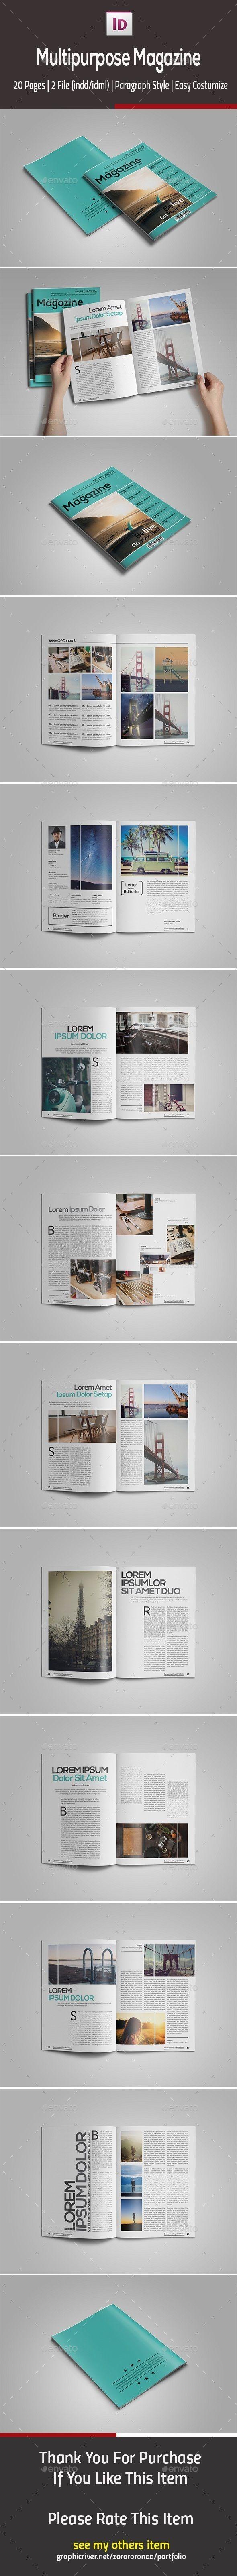 Multipurpose Magazine Design Tempalte #journal Download: http://graphicriver.net/item/multipurpose-magazine-template/12943696?ref=ksioks